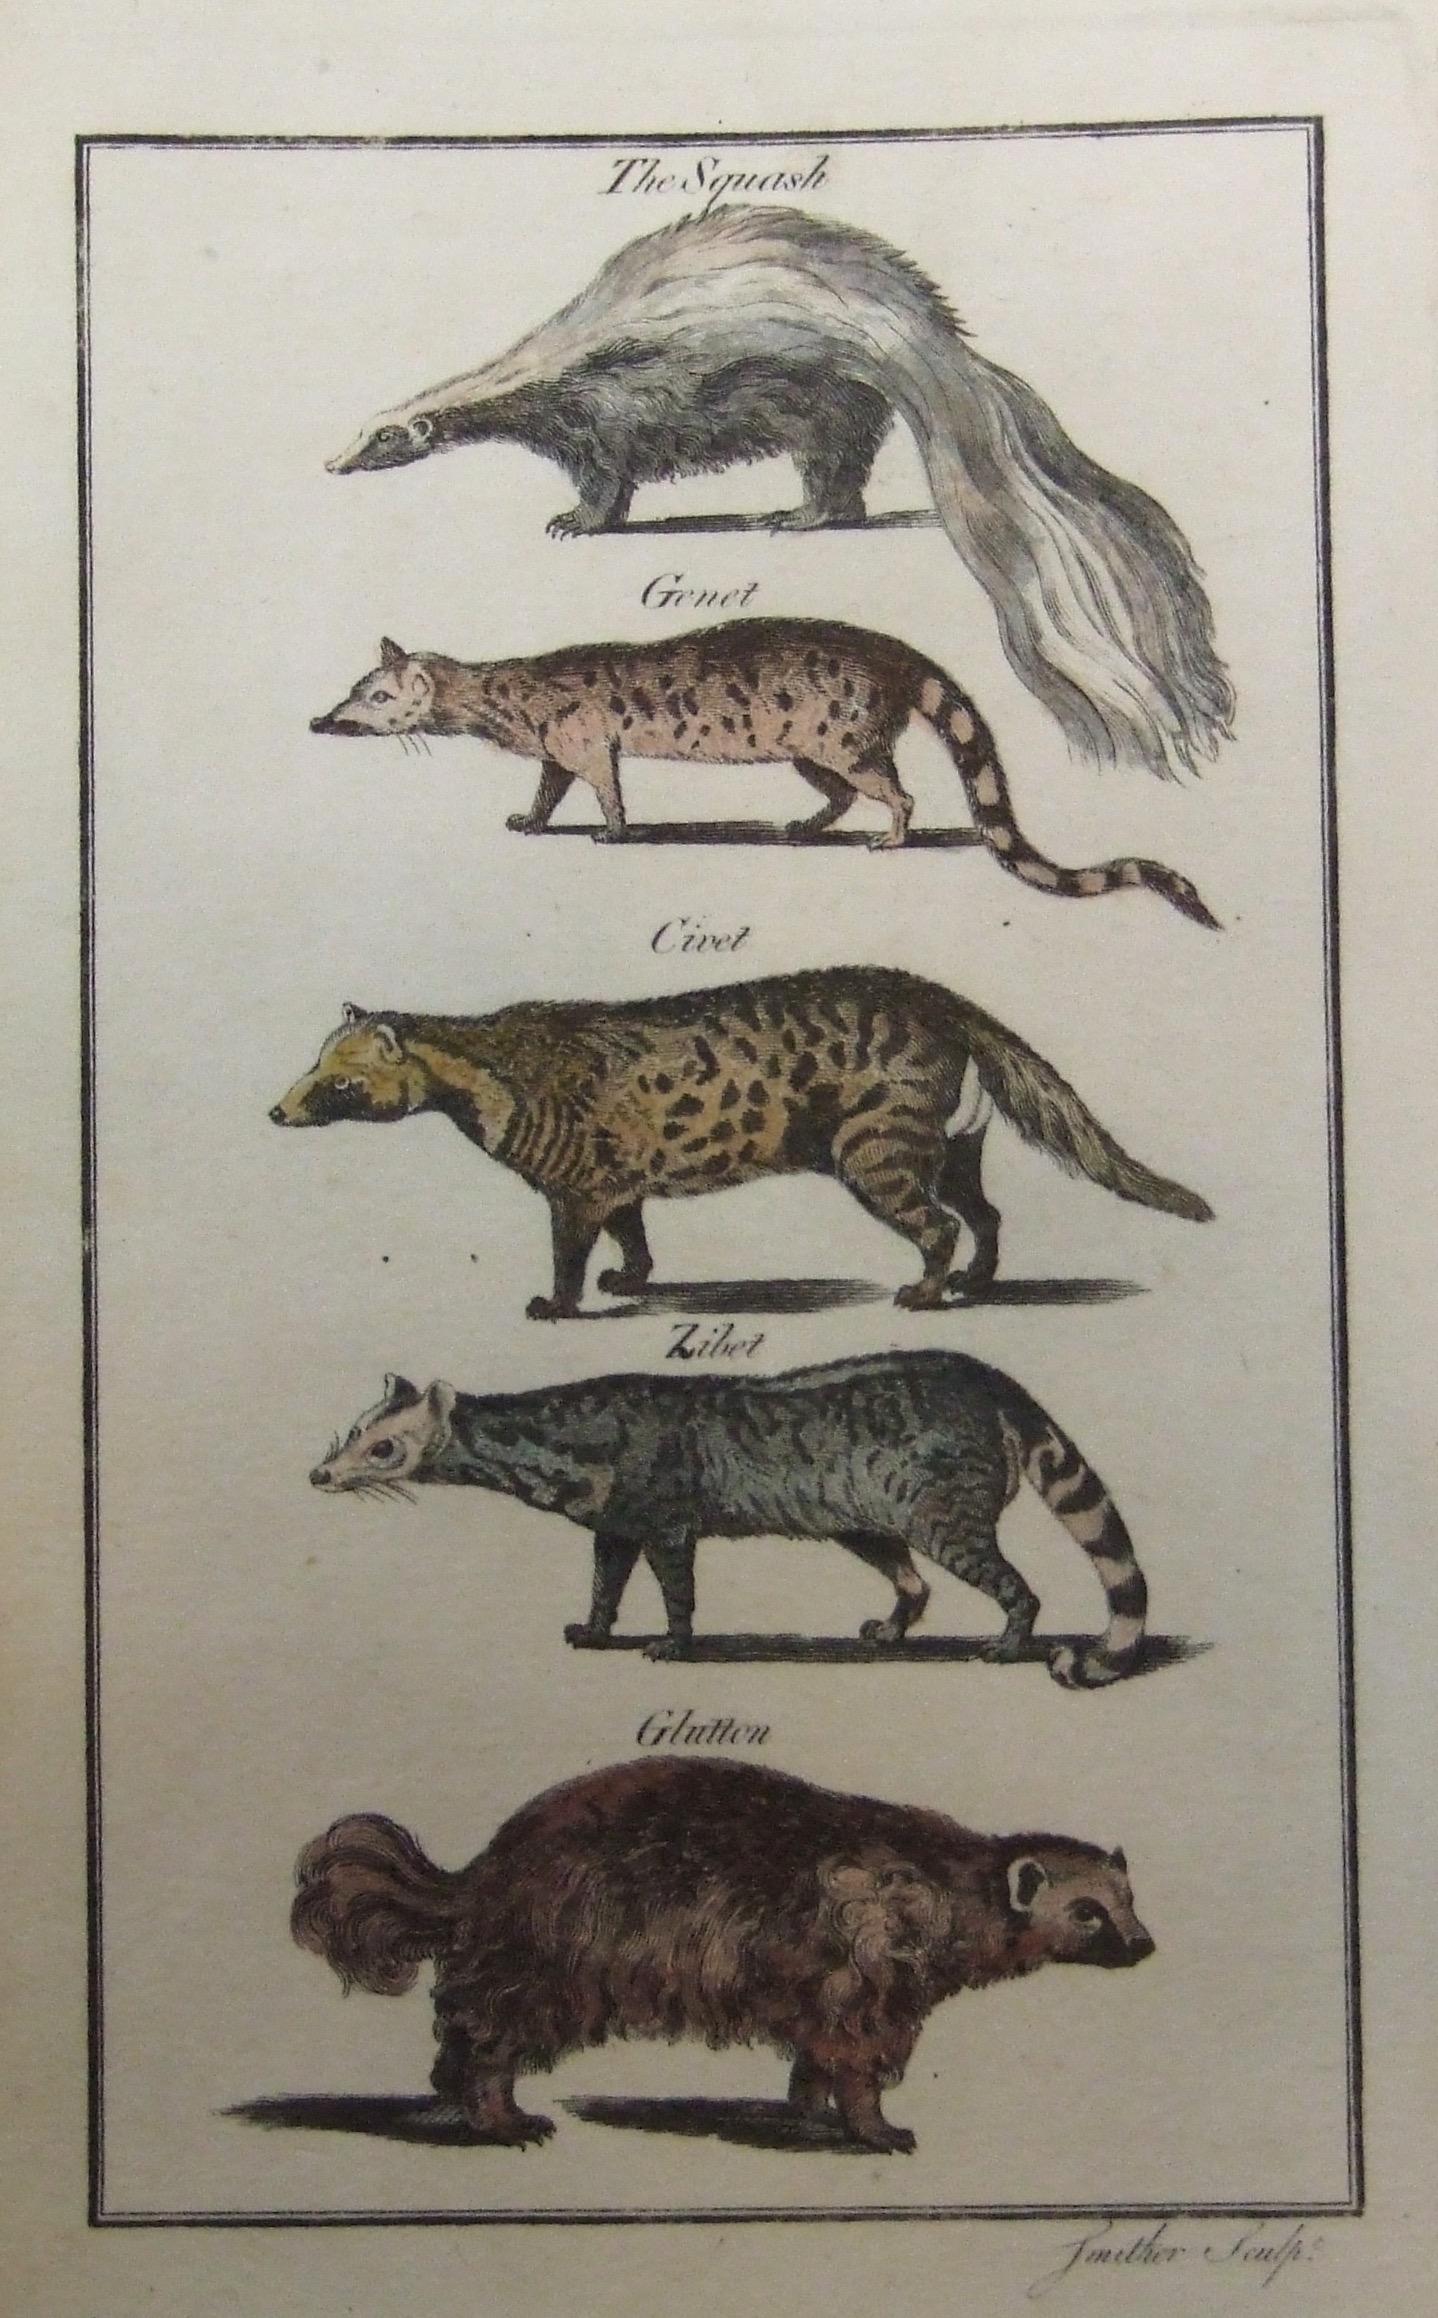 The Squash (Skunk), Genet, Civet, Zibet, Glutton